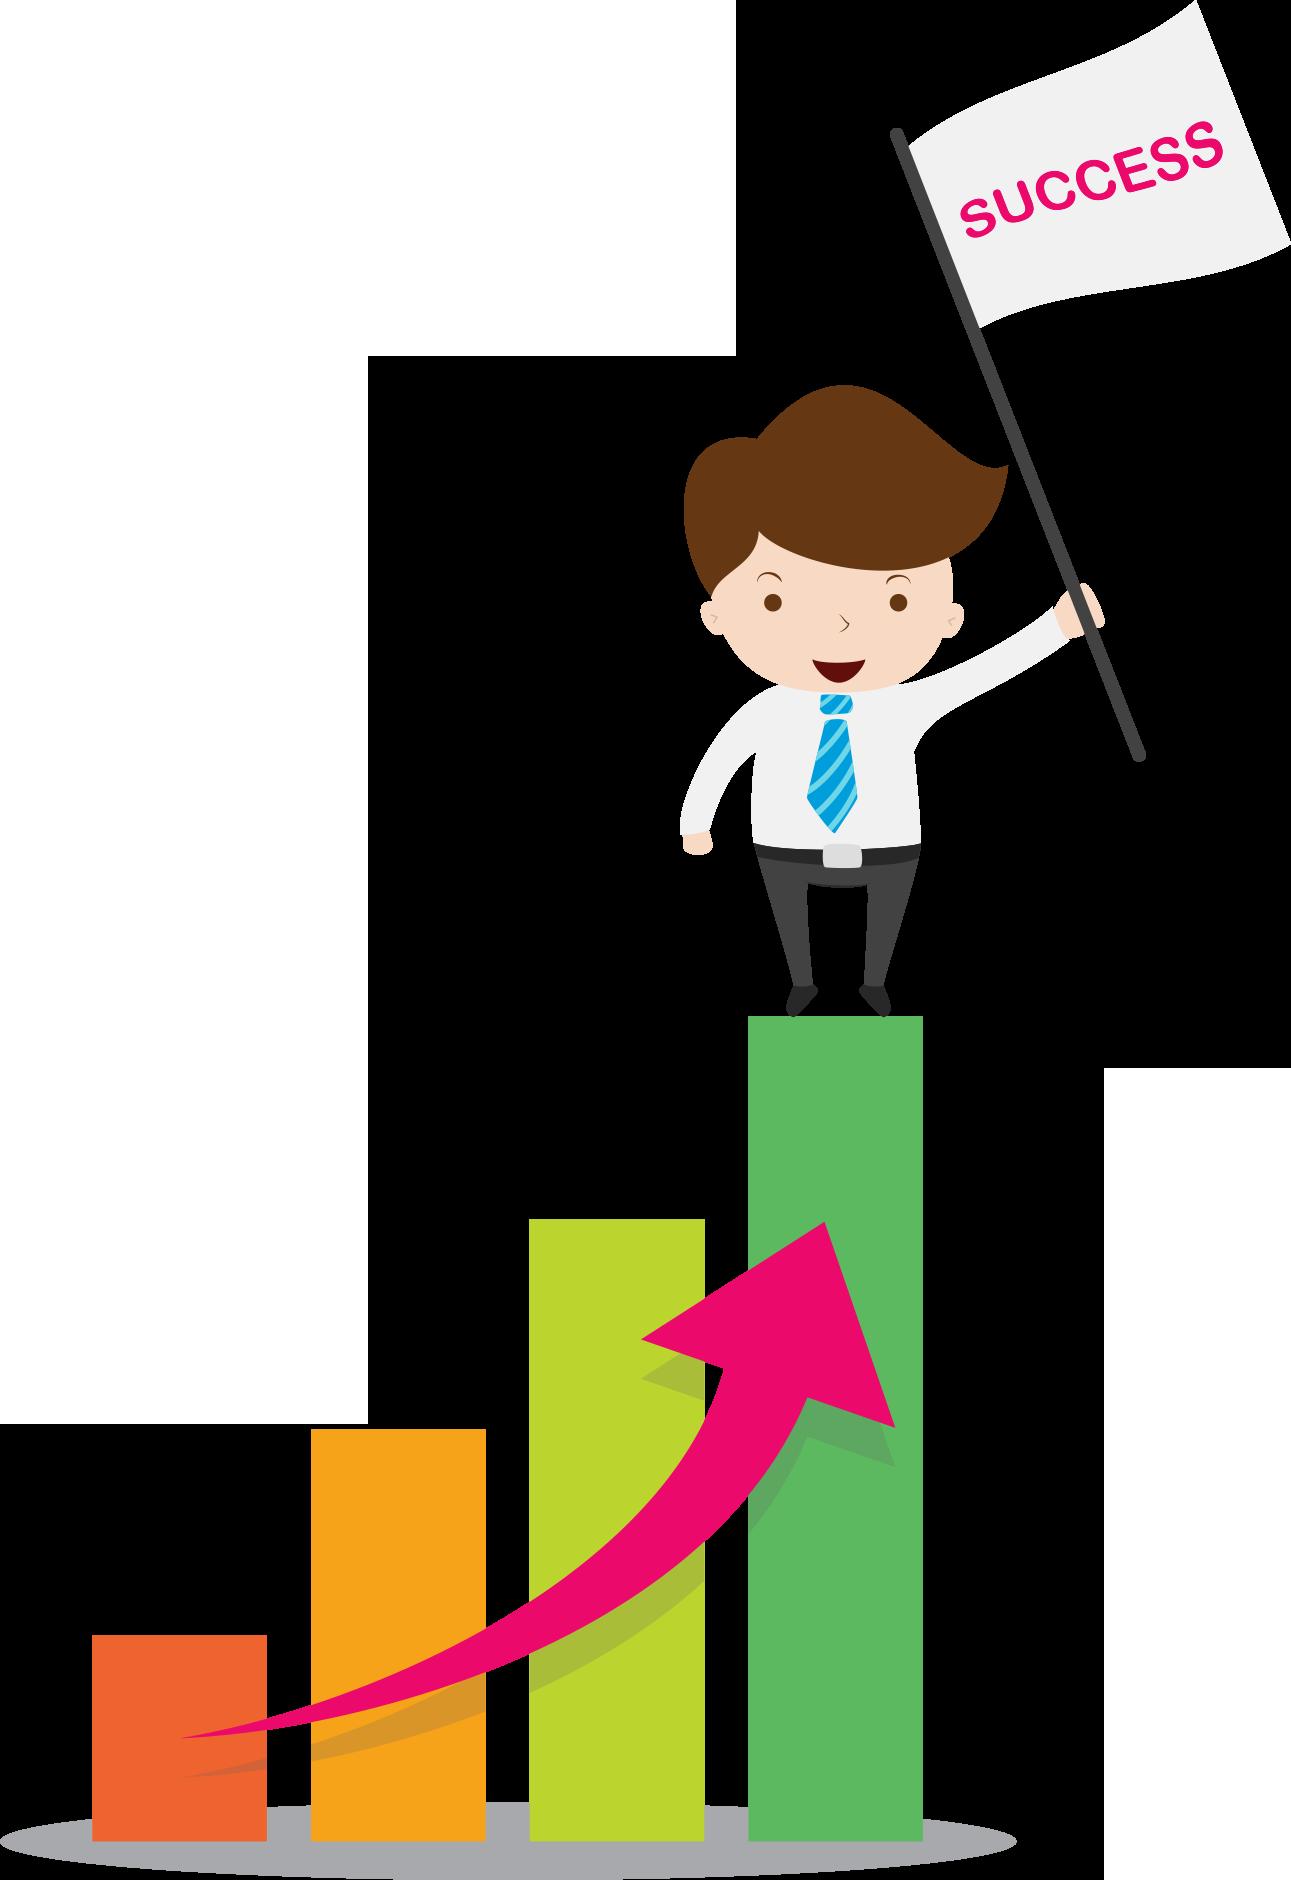 Teacher-s professional development clipart freeuse stock 5 Principles of Professional Development for Teachers ... freeuse stock